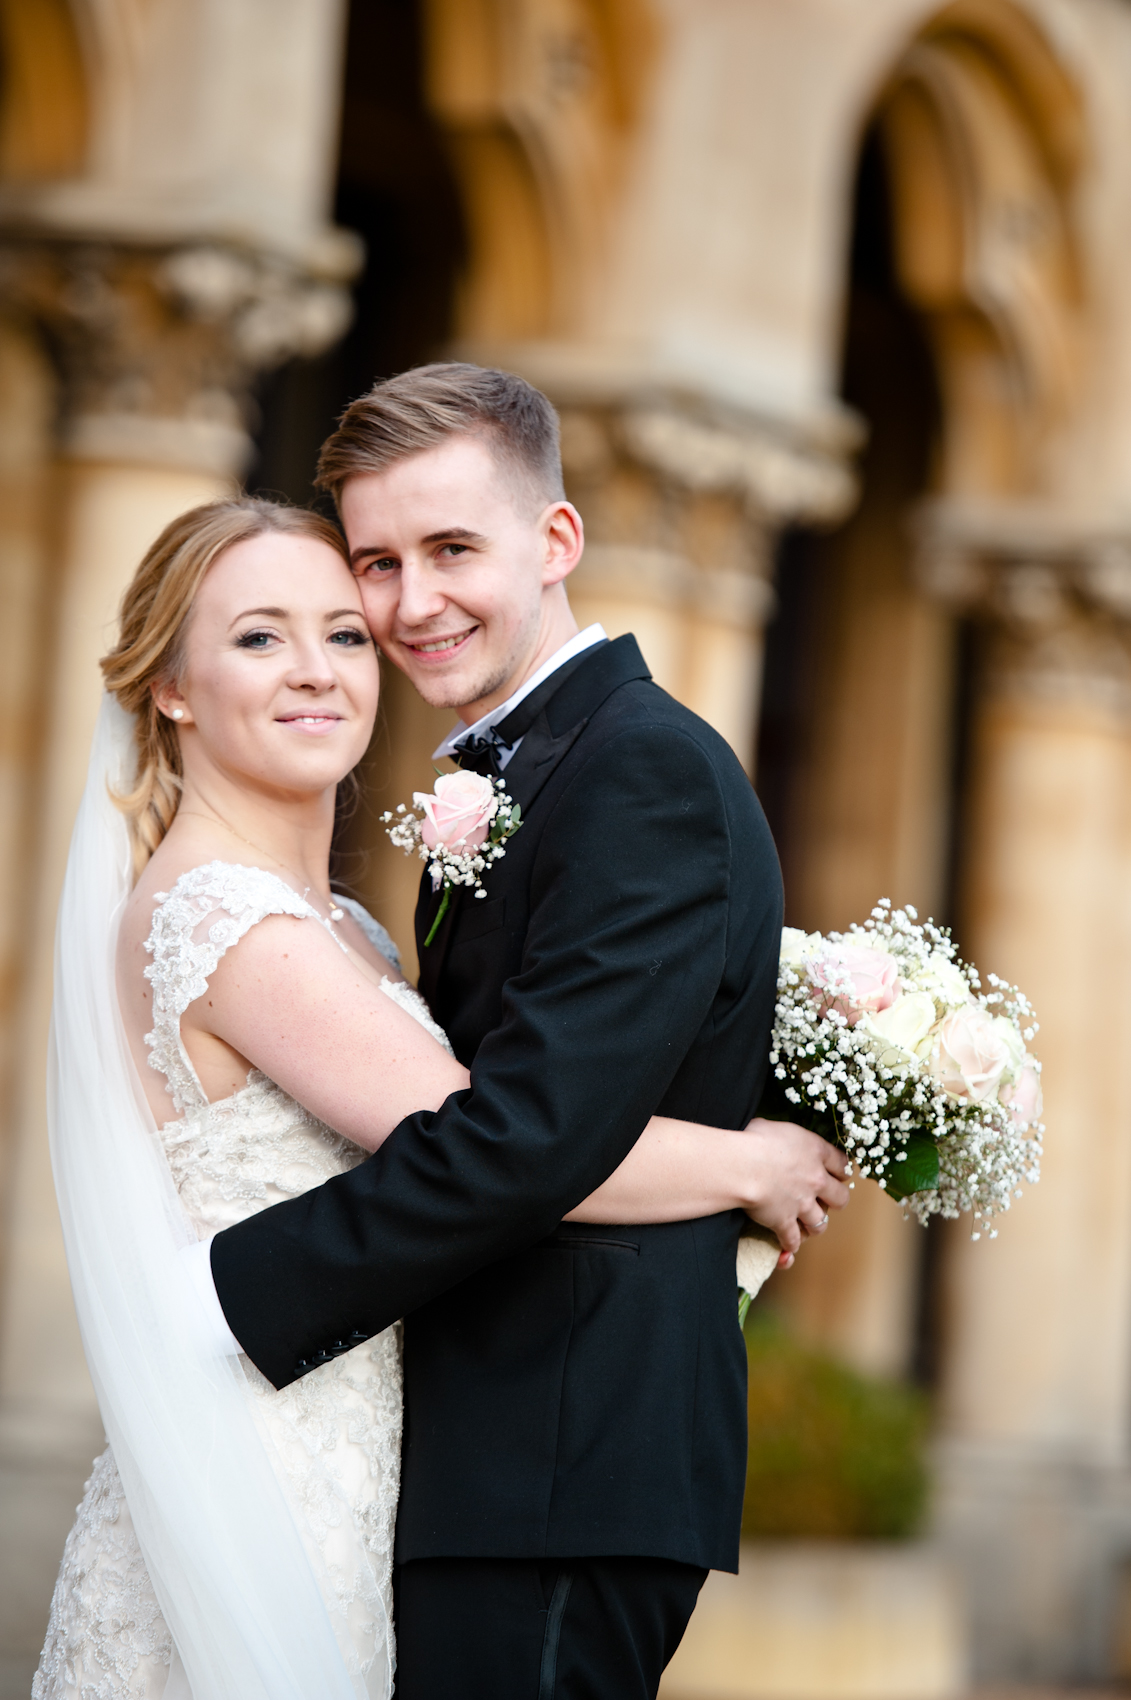 Declan & Emma wedding (10 of 29).jpg